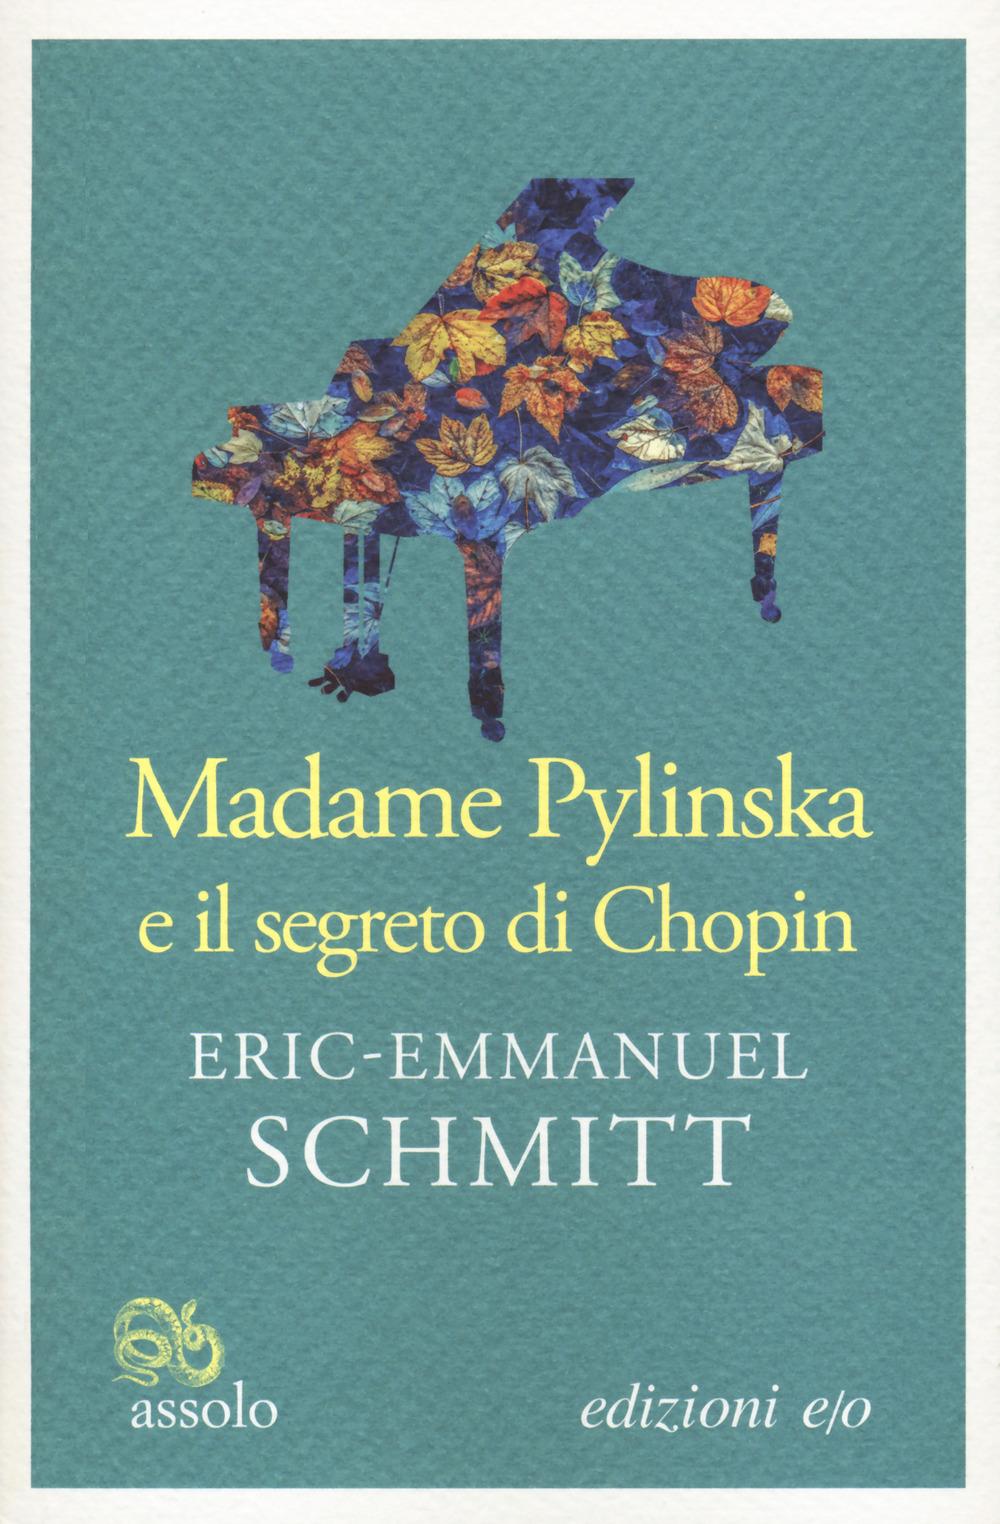 MADAME PYLINSKA E IL SEGRETO DI CHOPIN - Schmitt Eric-Emmanuel - 9788833572284